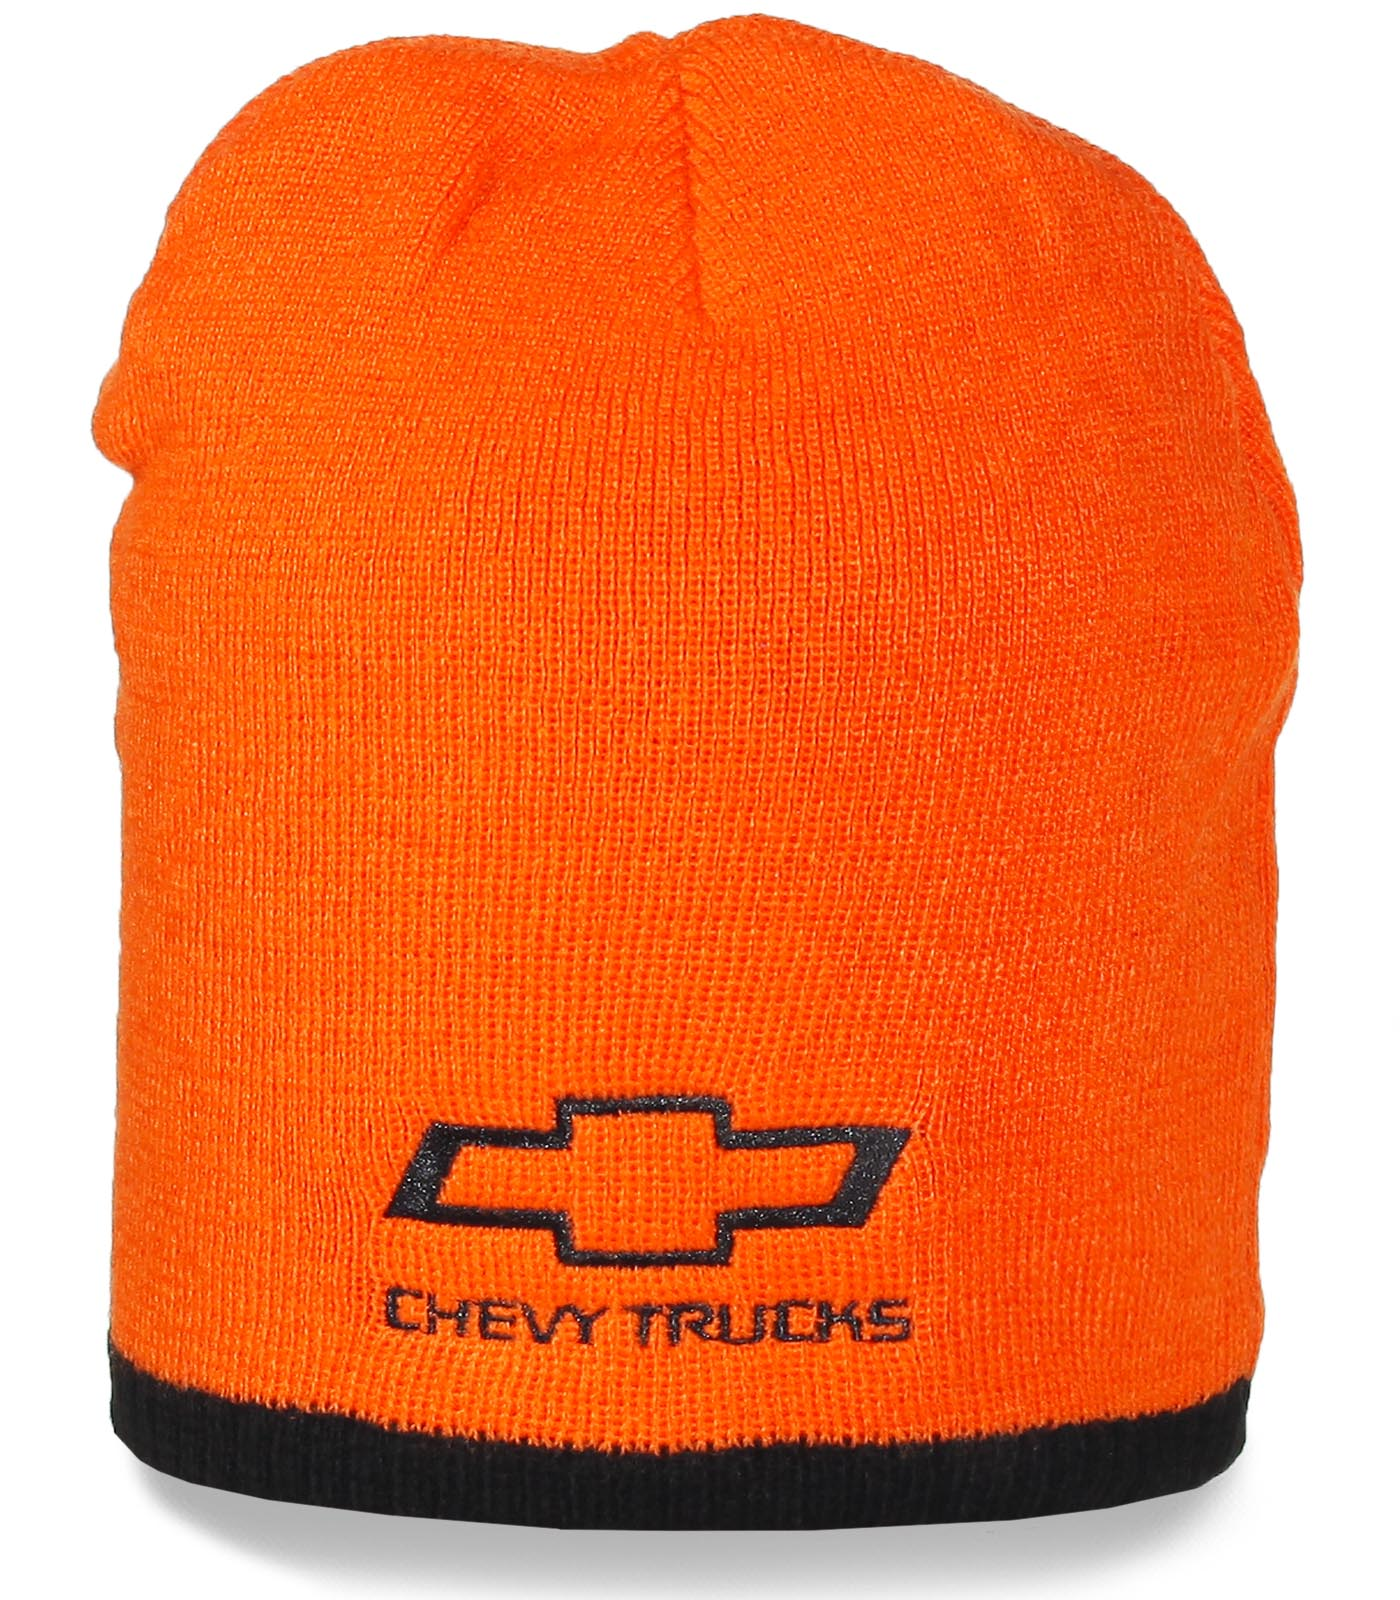 Яркая брендовая шапка с надписью Chevy Trucks